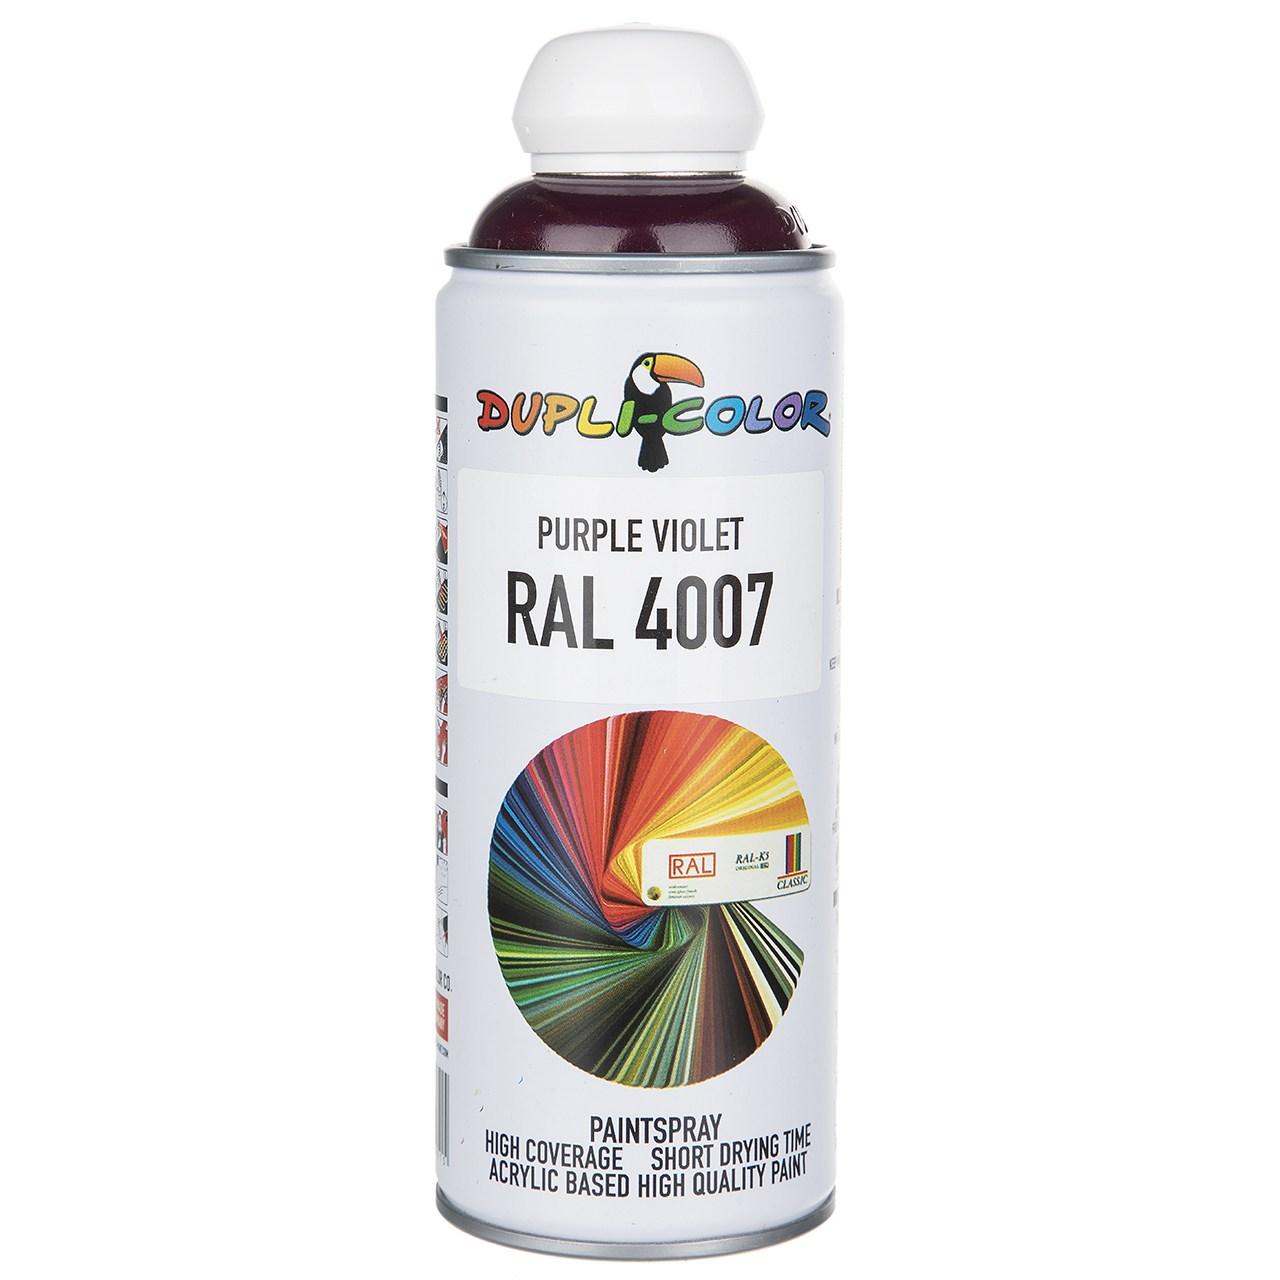 قیمت                                      اسپری رنگ بنفش دوپلی کالر مدل RAL 4007 حجم 400 میلی لیتر